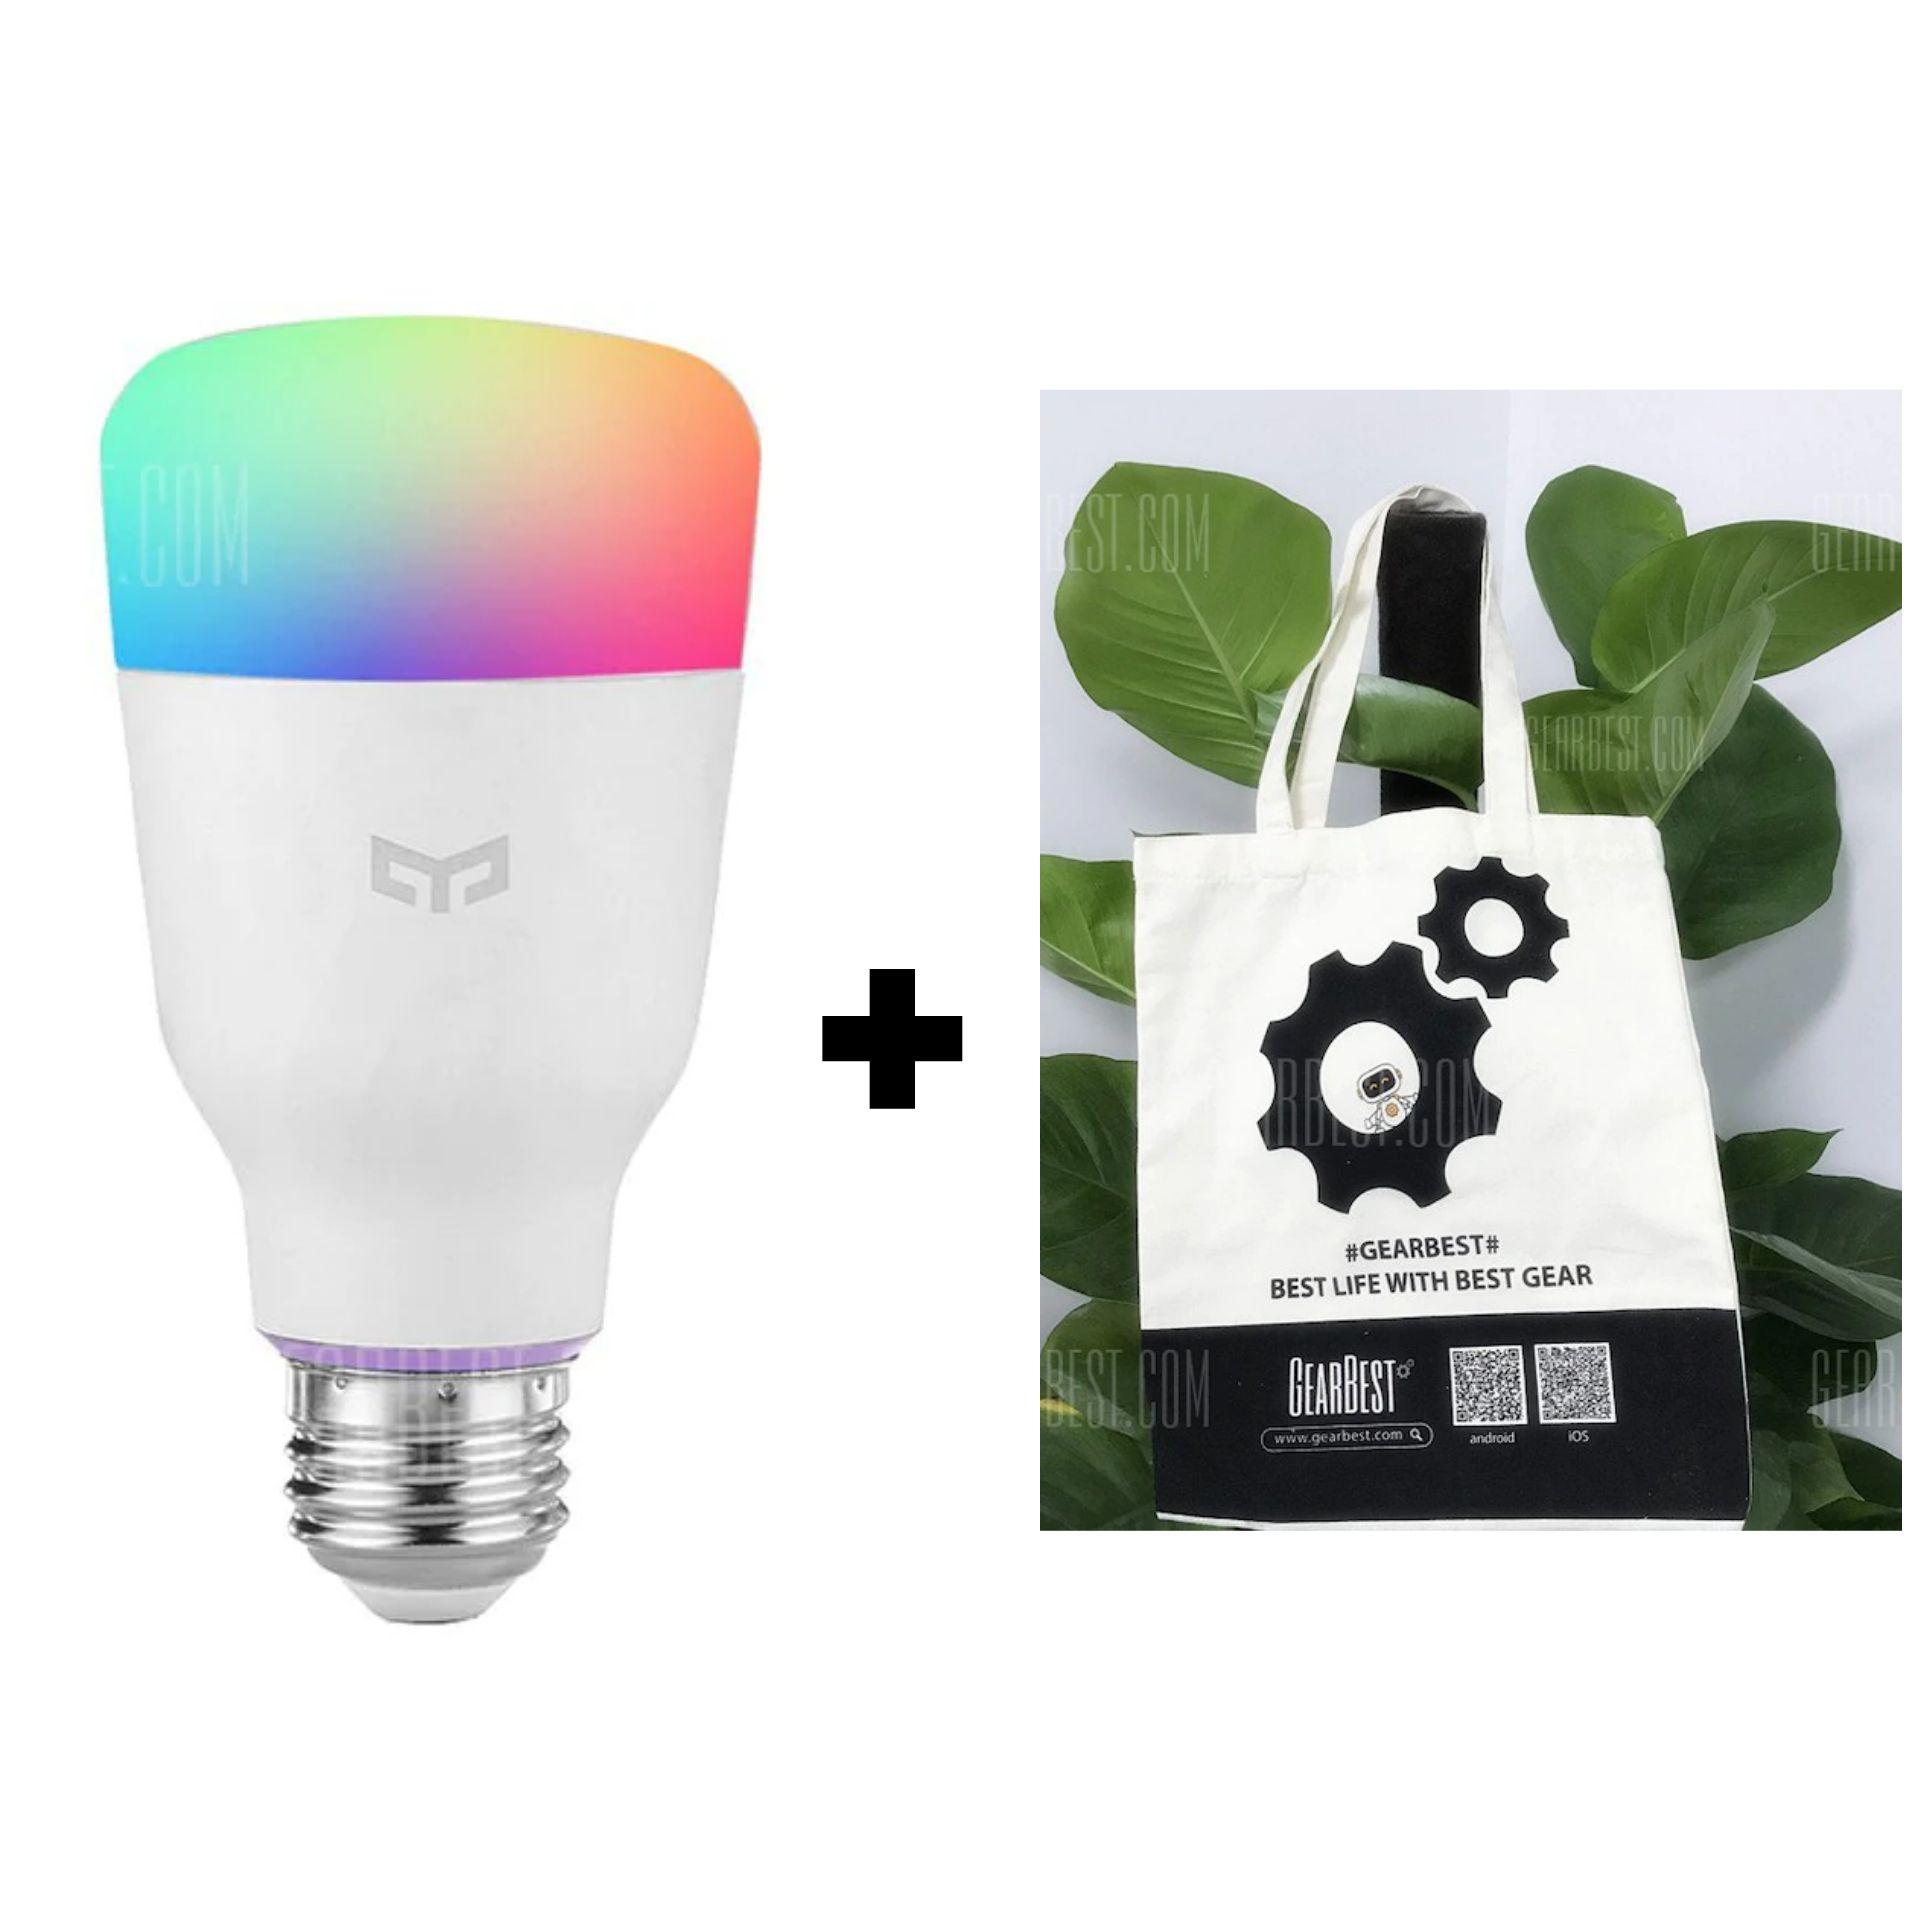 [Gearbest] Yeelight RGB Bulb + Gearbest Handtasche aus EU Lager